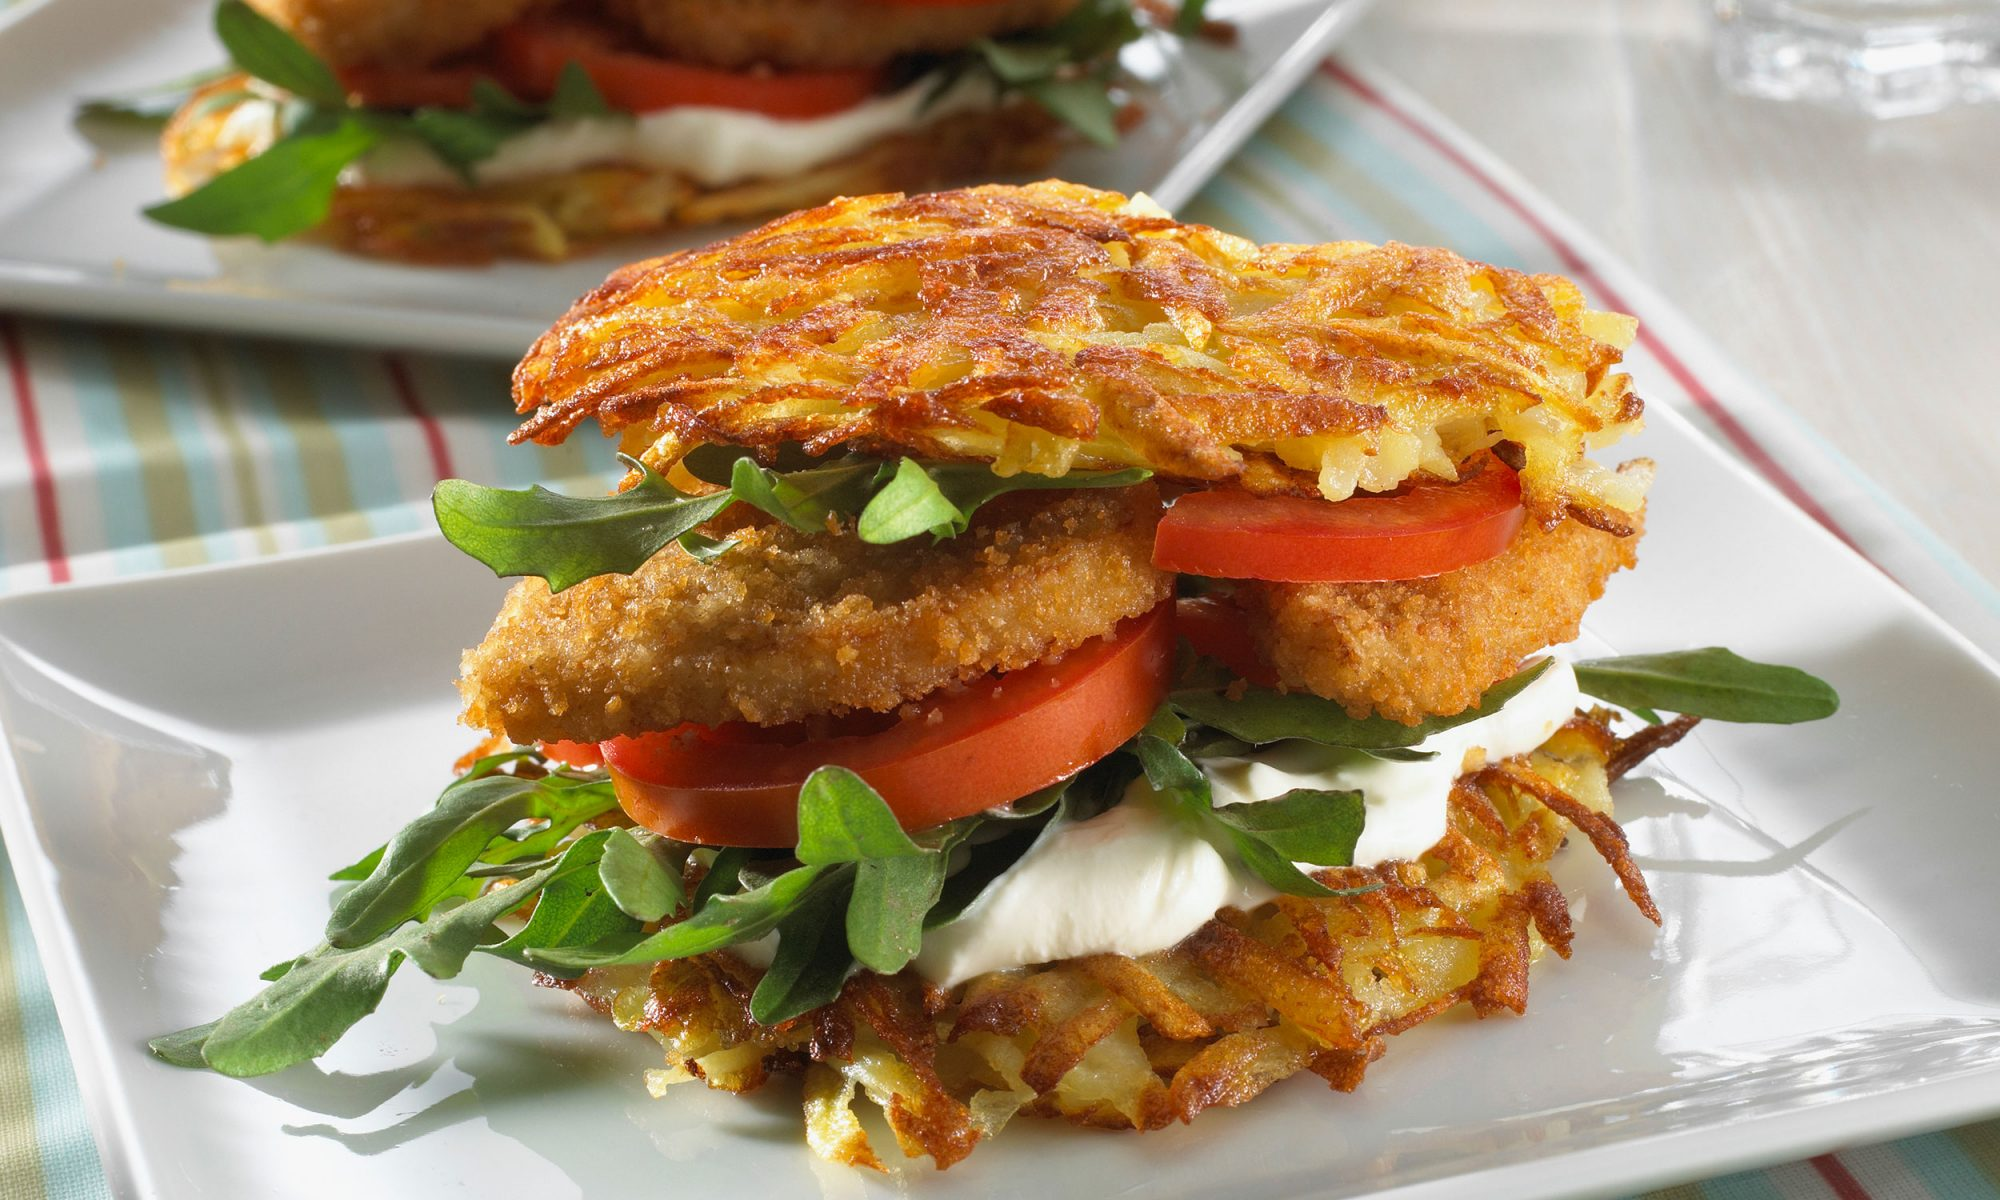 EC: Leftover Latkes Make a Superior Breakfast Sandwich